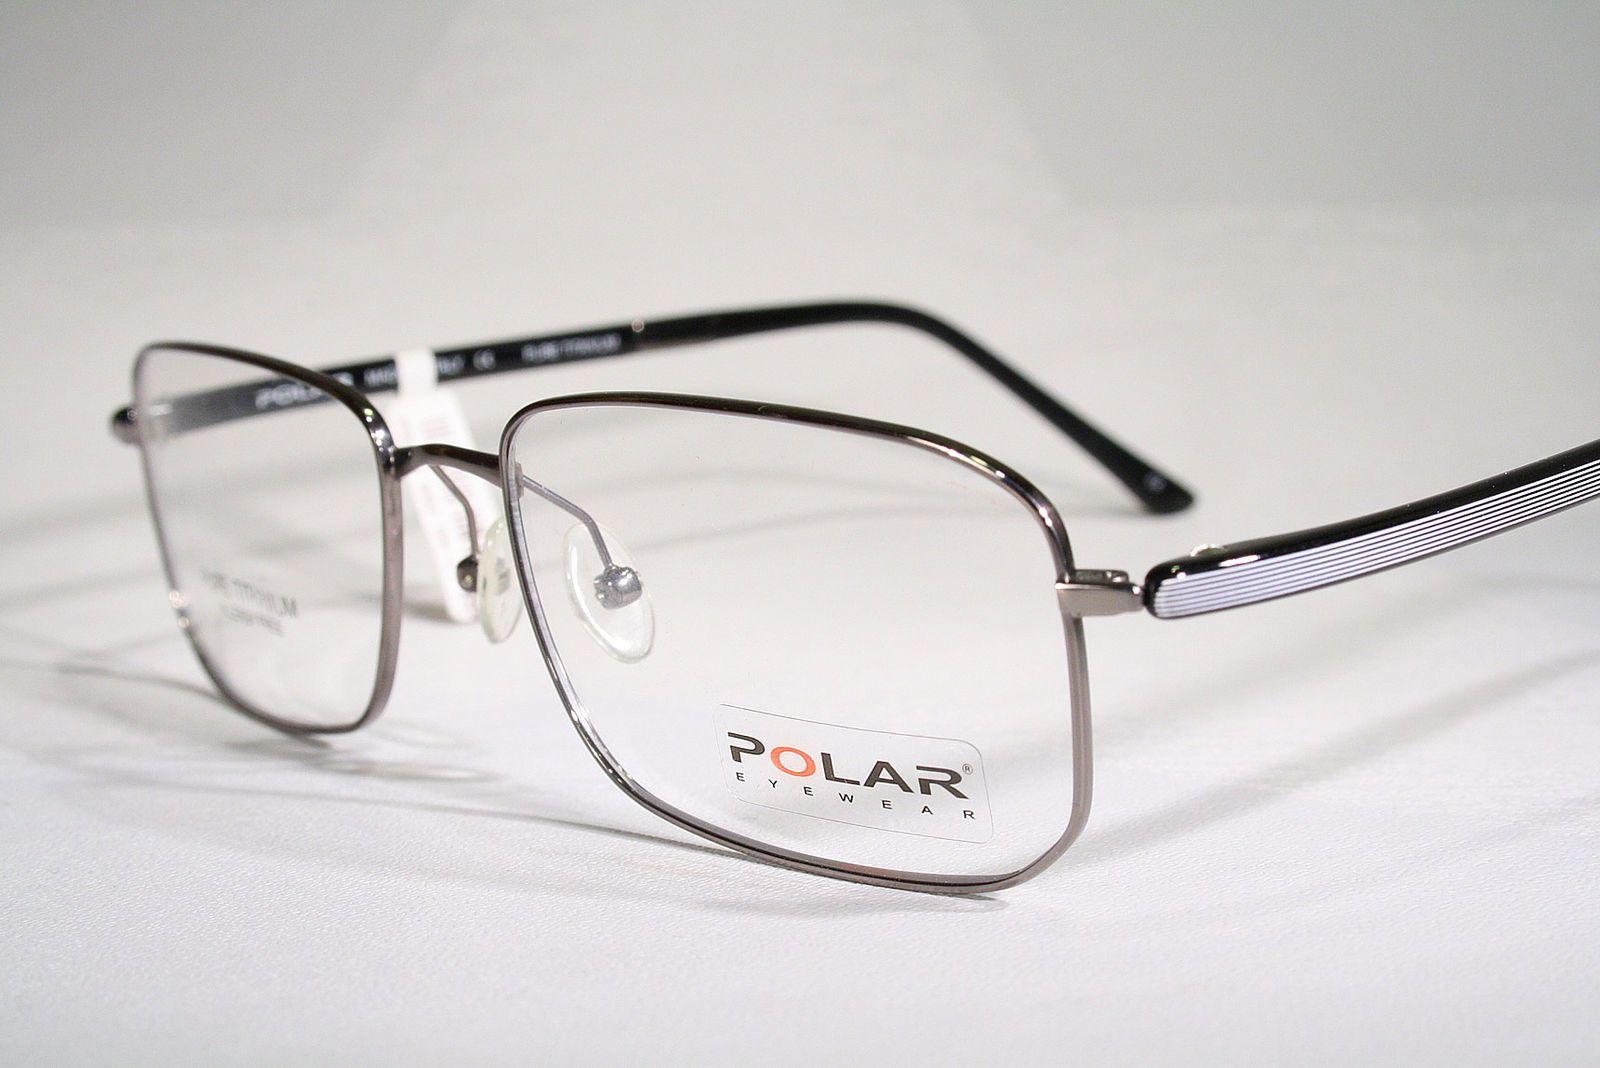 bd9b7f687d1 Titanium POLAR Mens Size Large Rectangular Light Optical Eyeglass Frames  Glasses